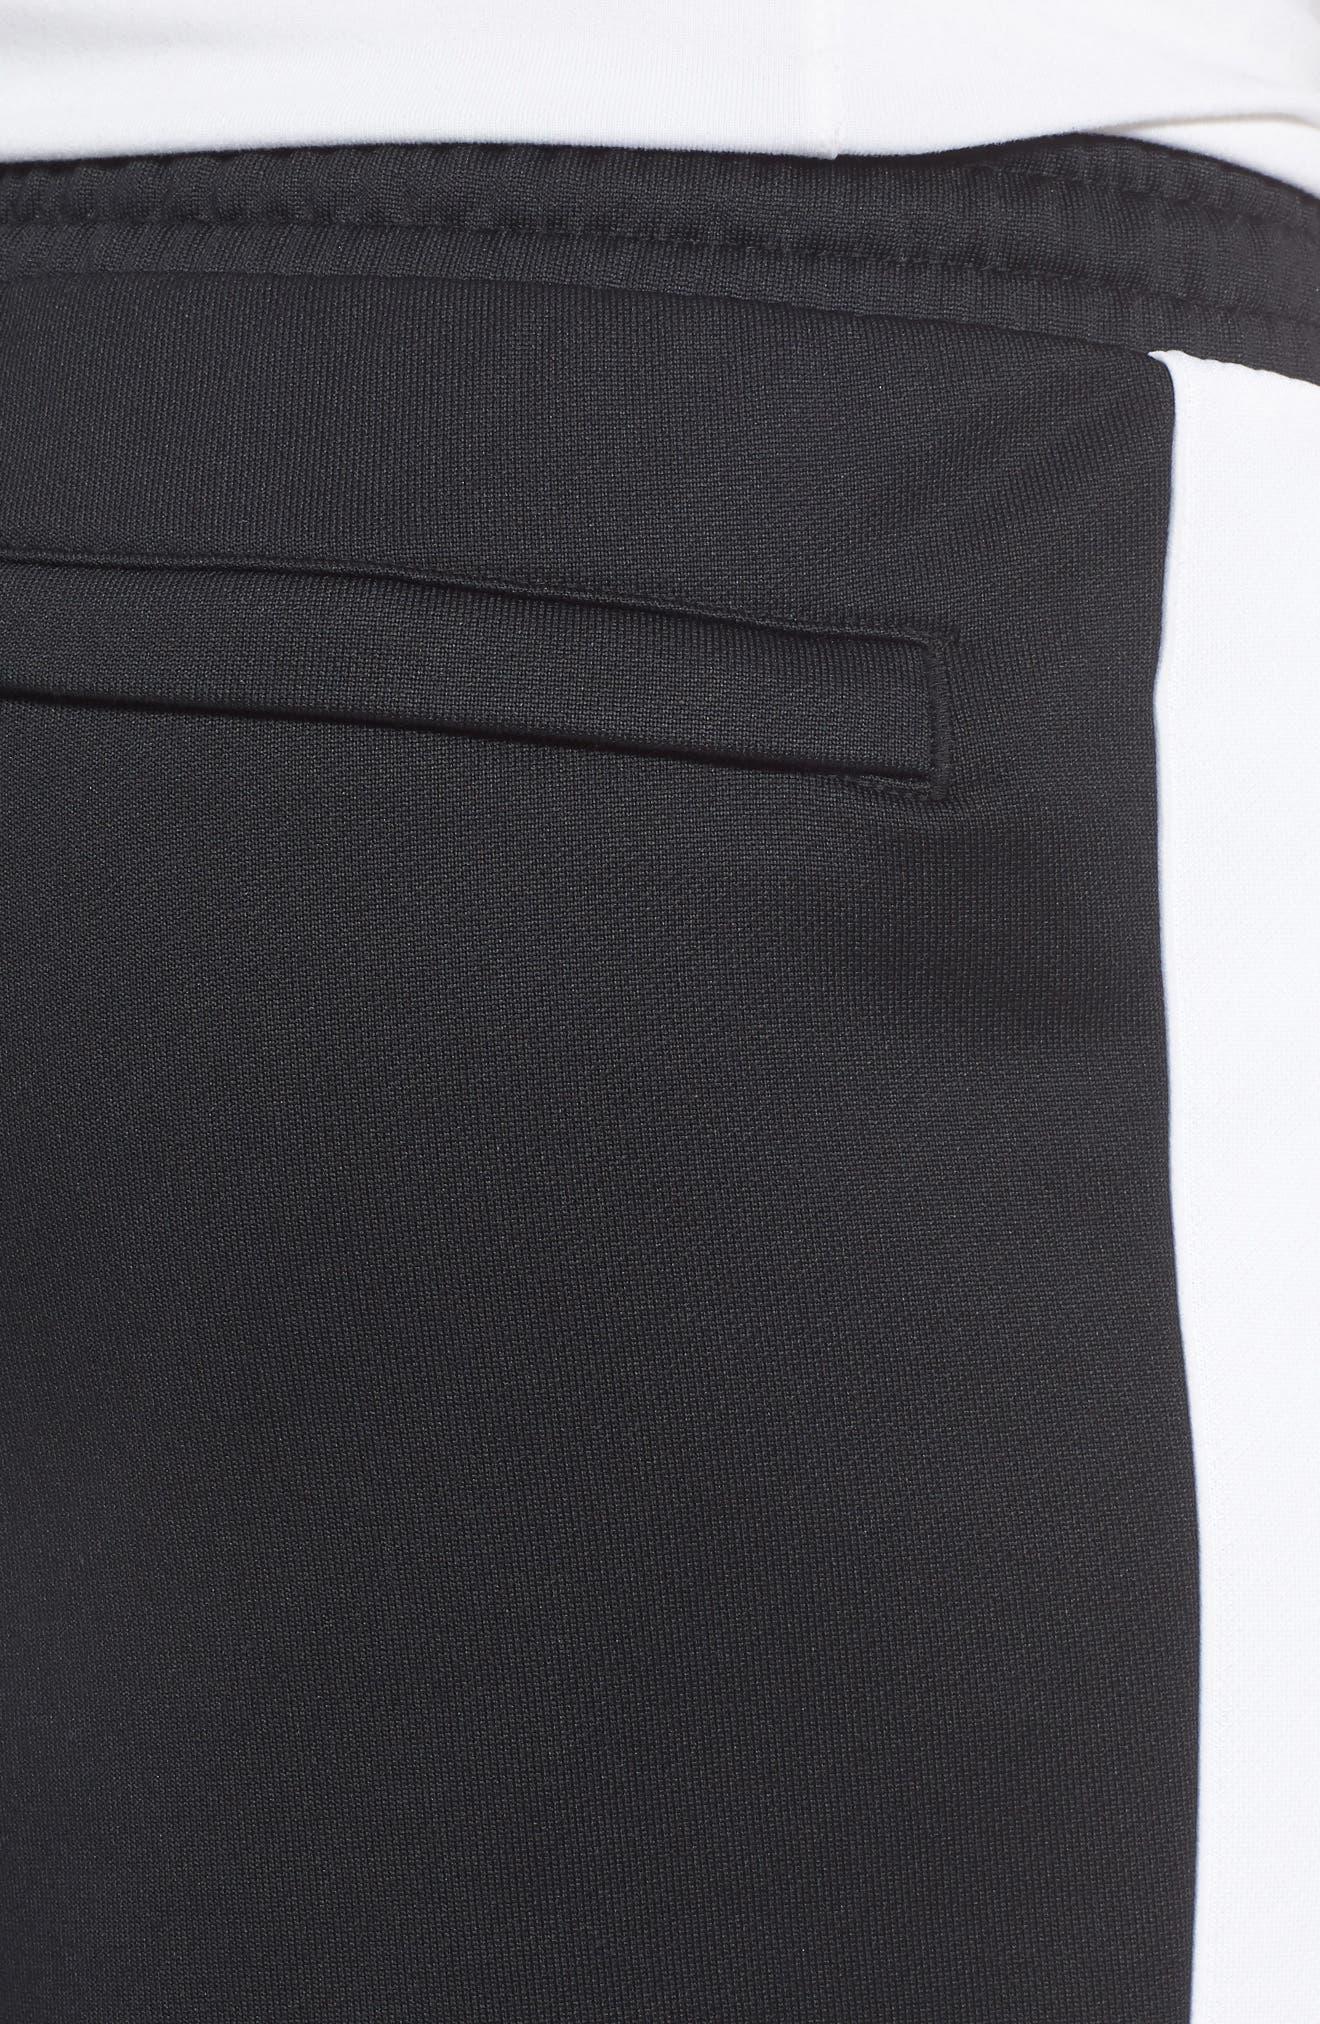 Retro Sweatpants,                             Alternate thumbnail 4, color,                             PUMA BLACK